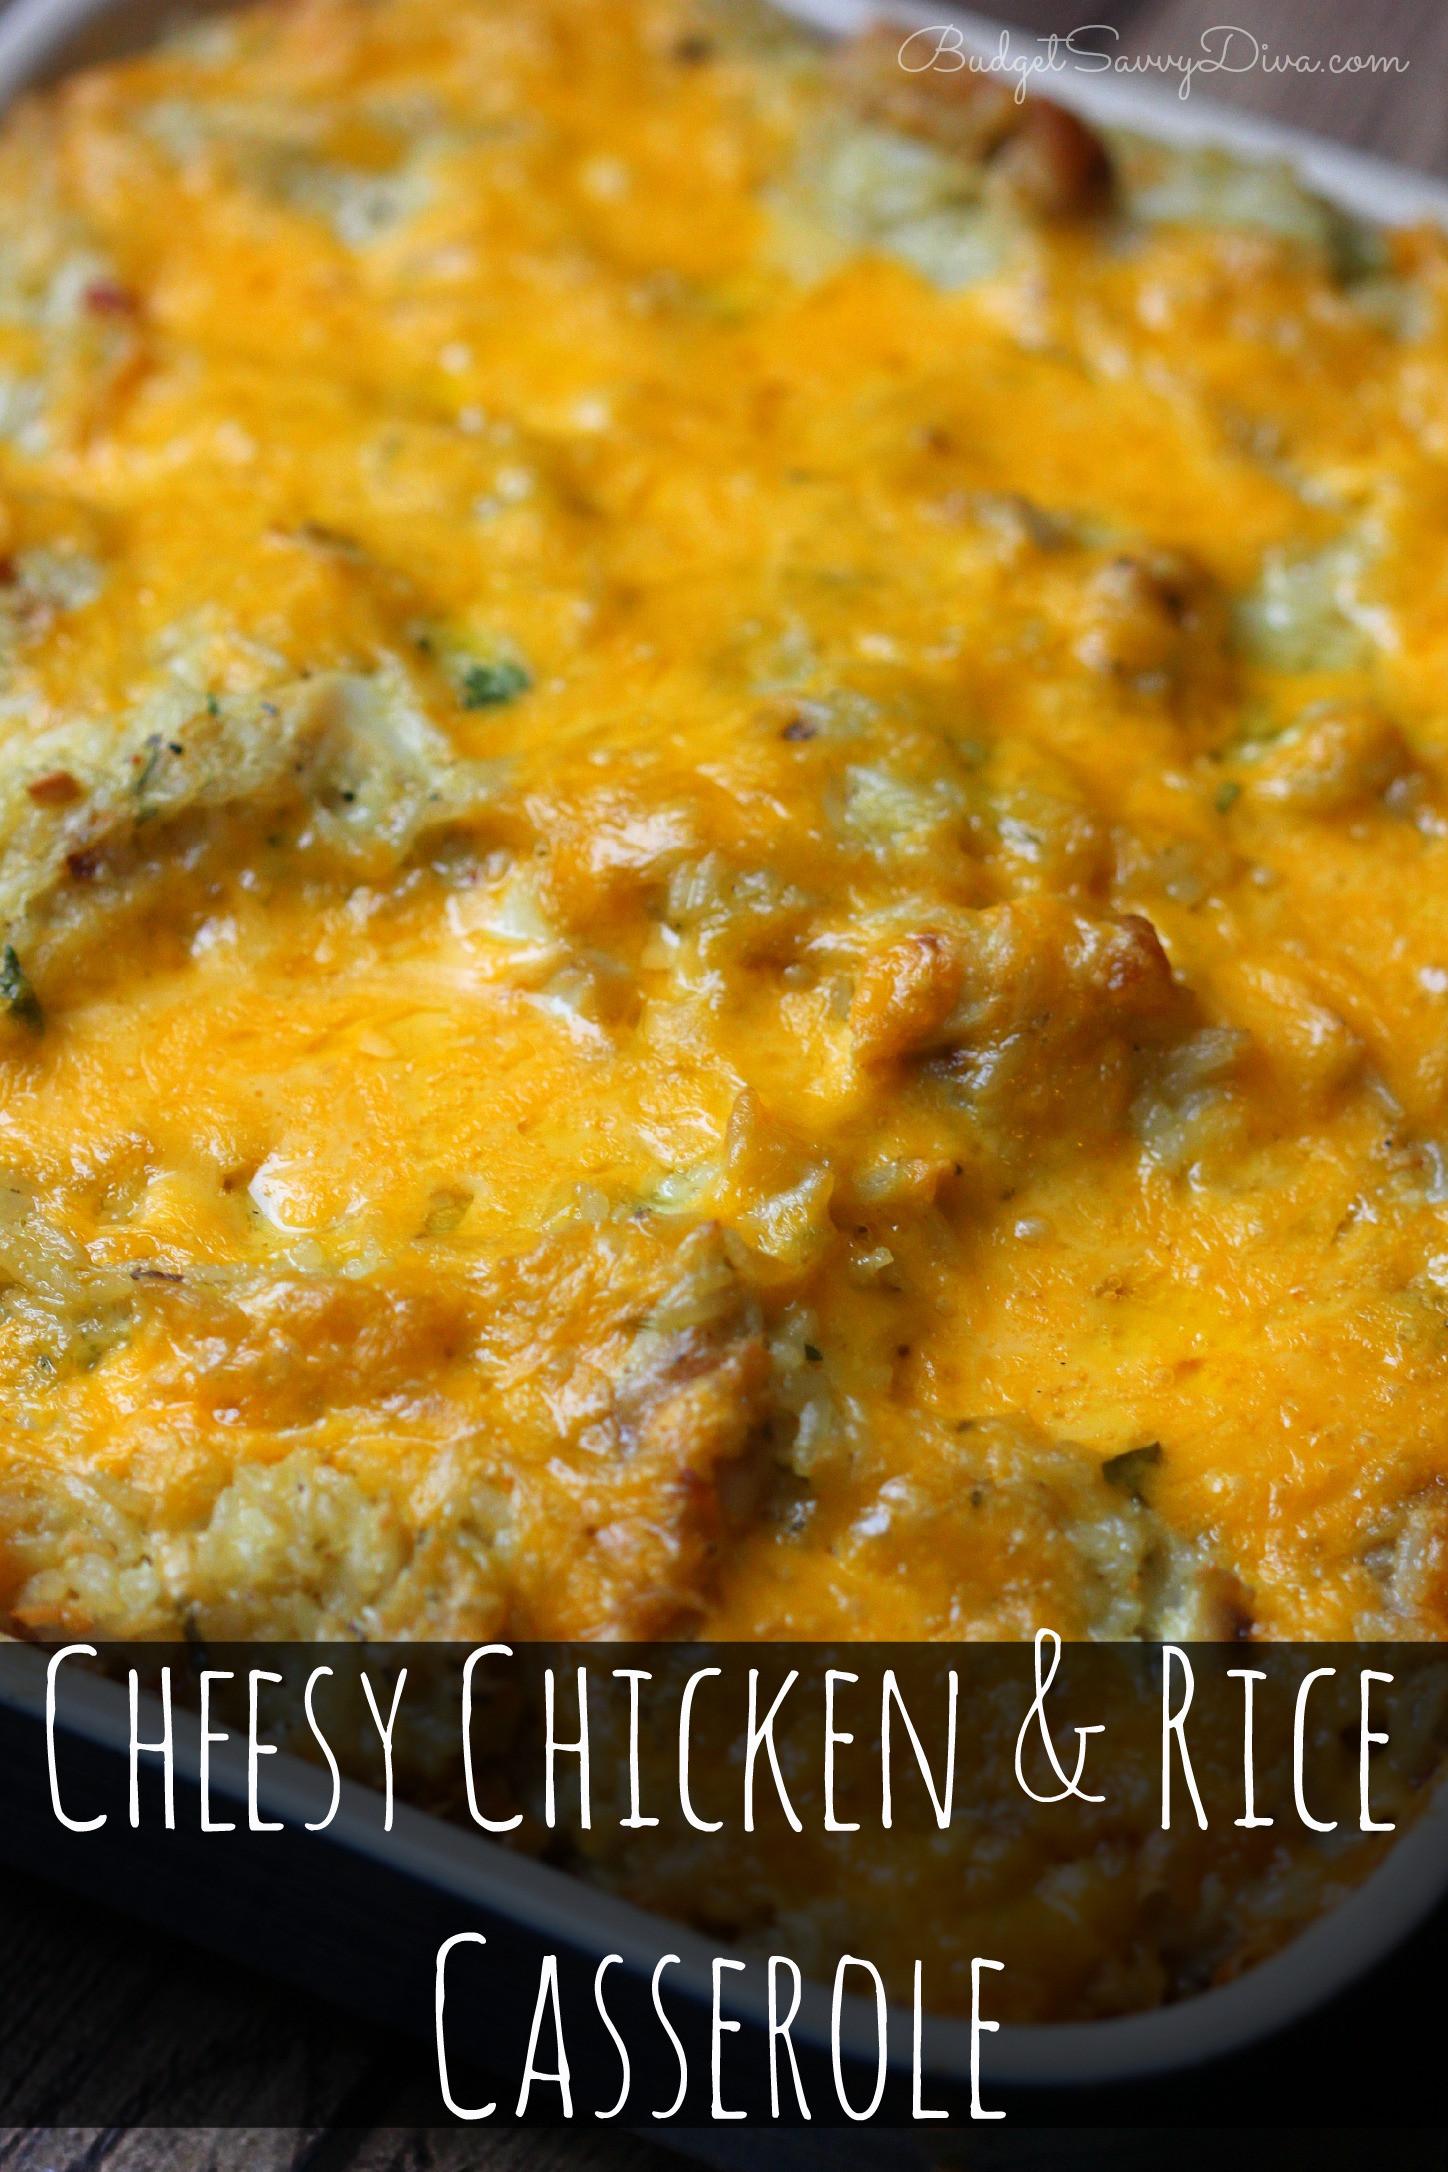 Cheesy Chicken And Rice Casserole  Cheesy Chicken and Rice Casserole Recipe